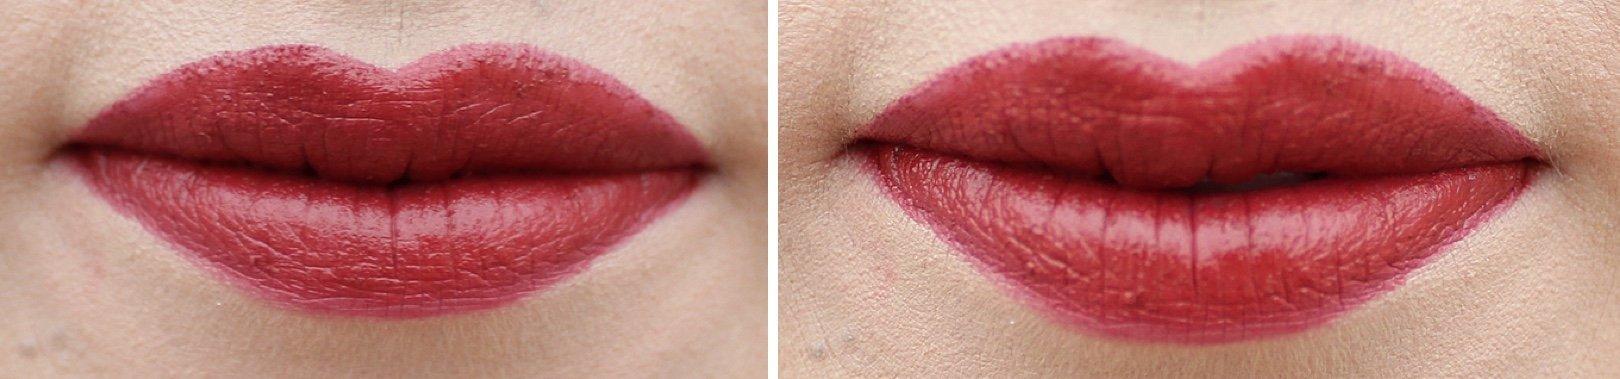 MAC Liptensity Lipstick Fire Roasted swatch